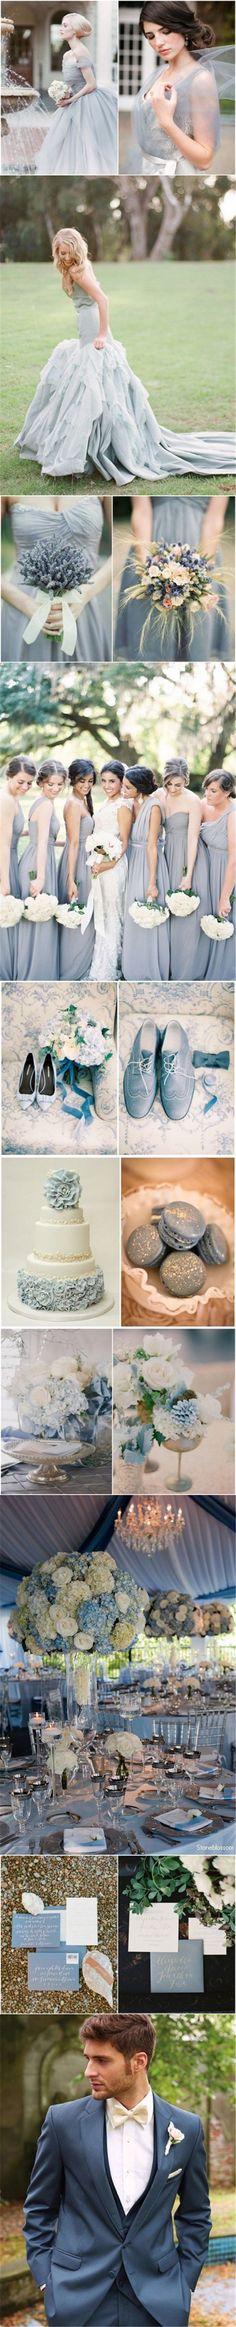 2015 wedding color ideas - dusty blue wedding color ideas for spring/ fall weddings